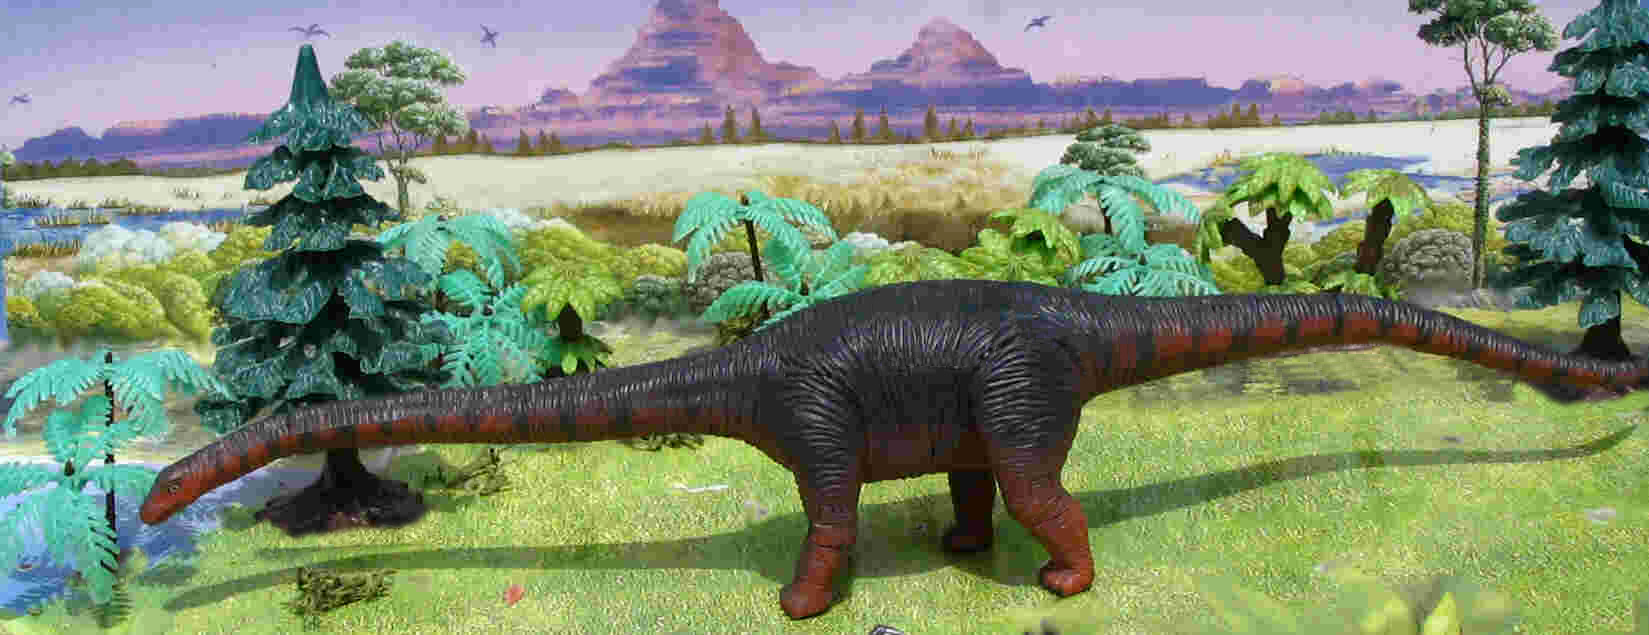 Image Gallery Seismosaurus